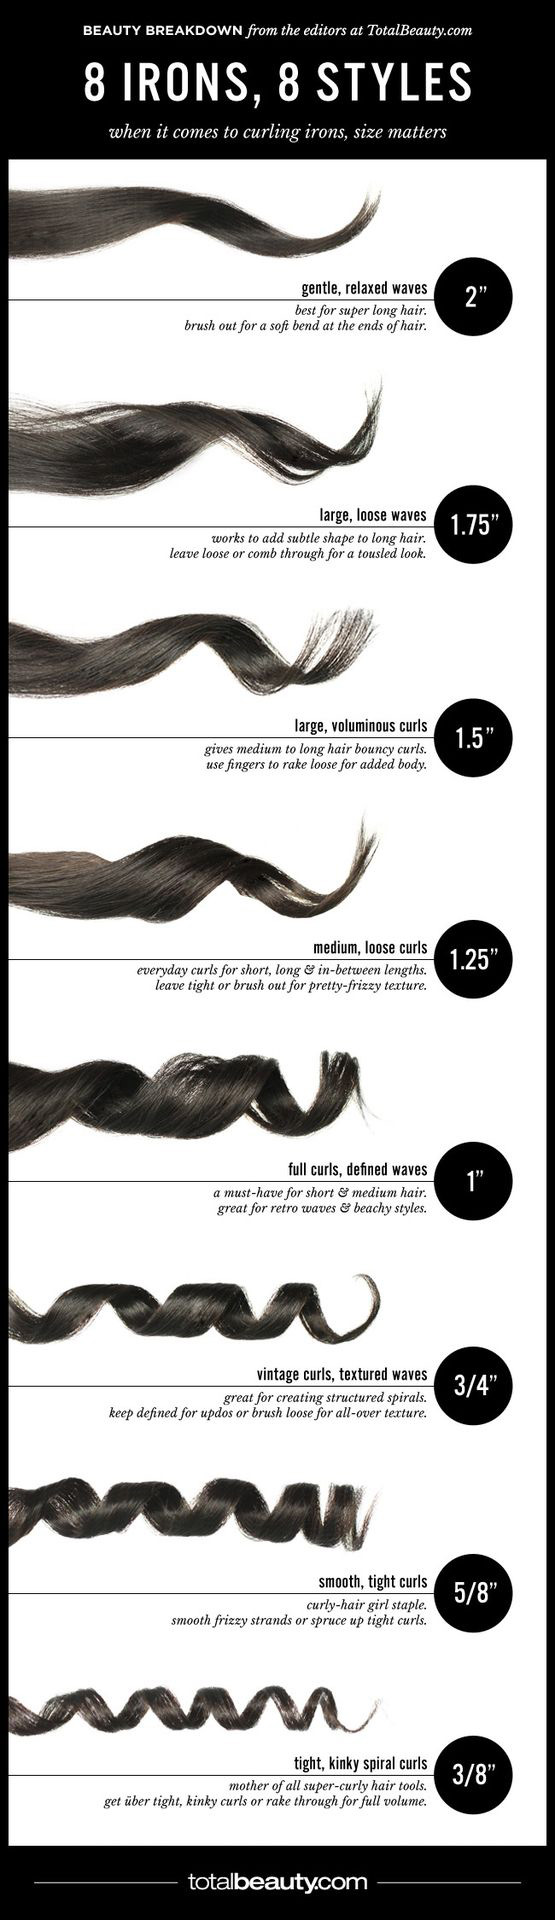 8 irons - 8 styles